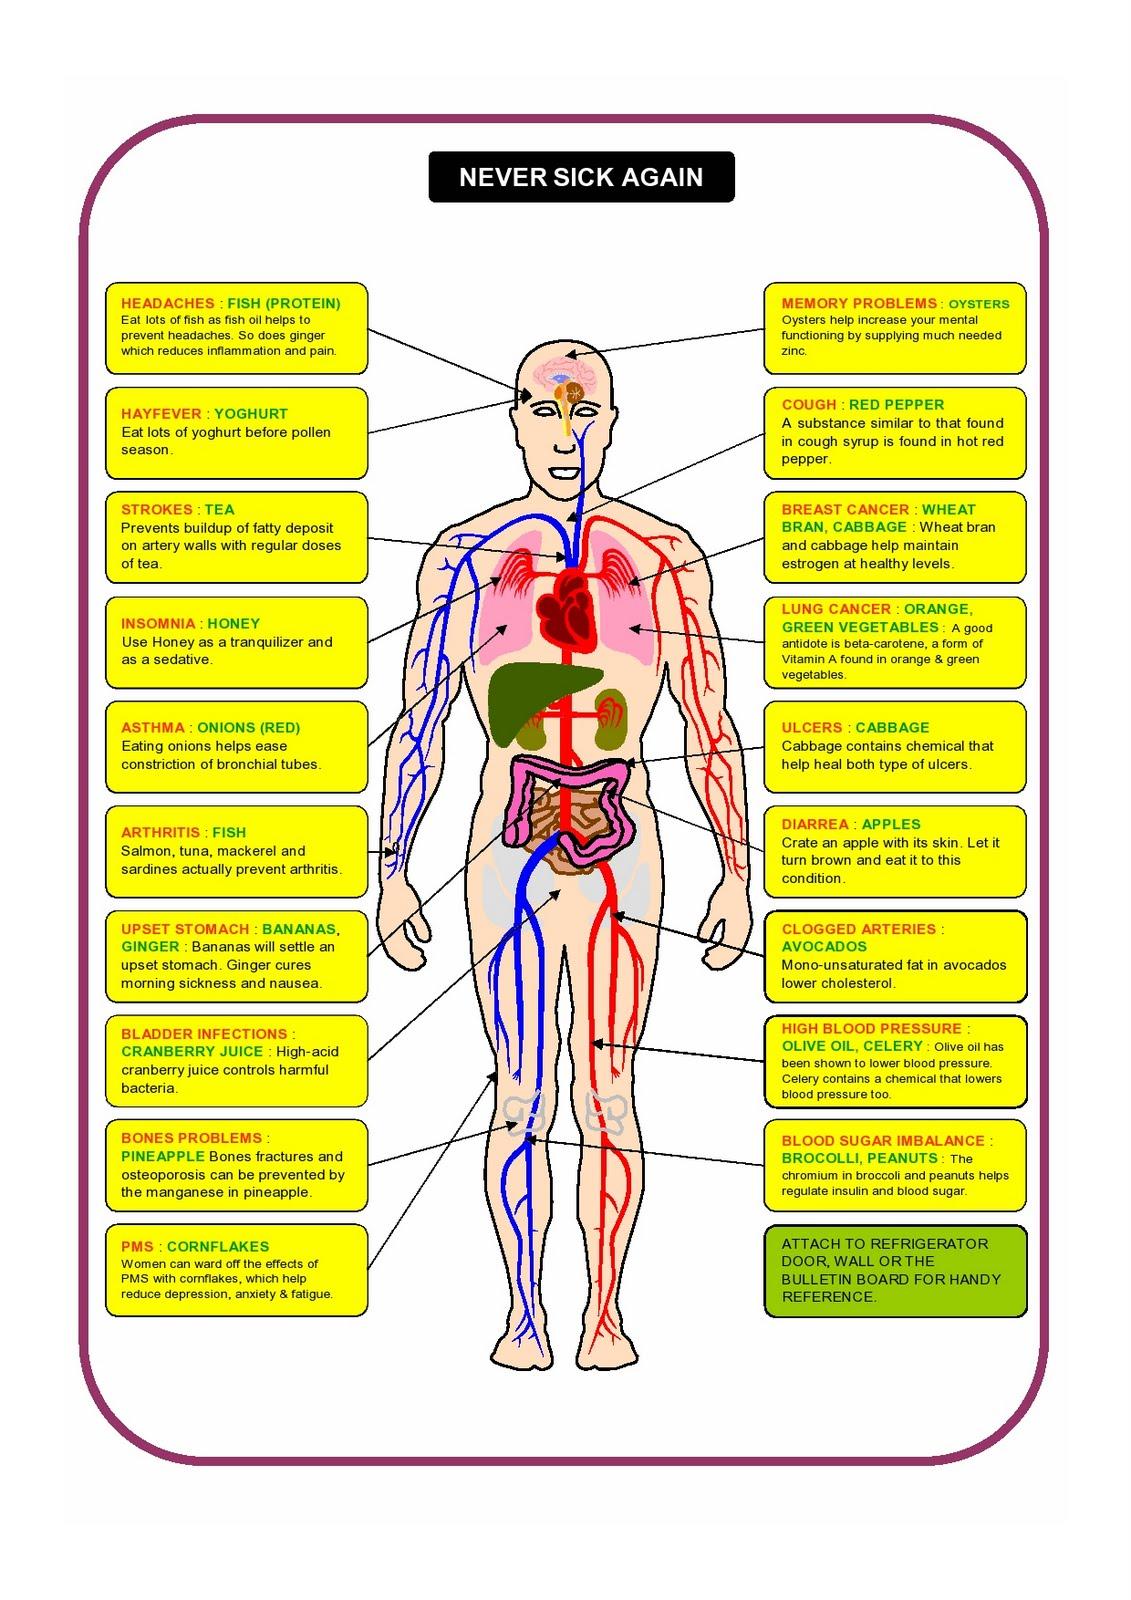 medium resolution of never sick again chart never sick again diagram health care tips health facts